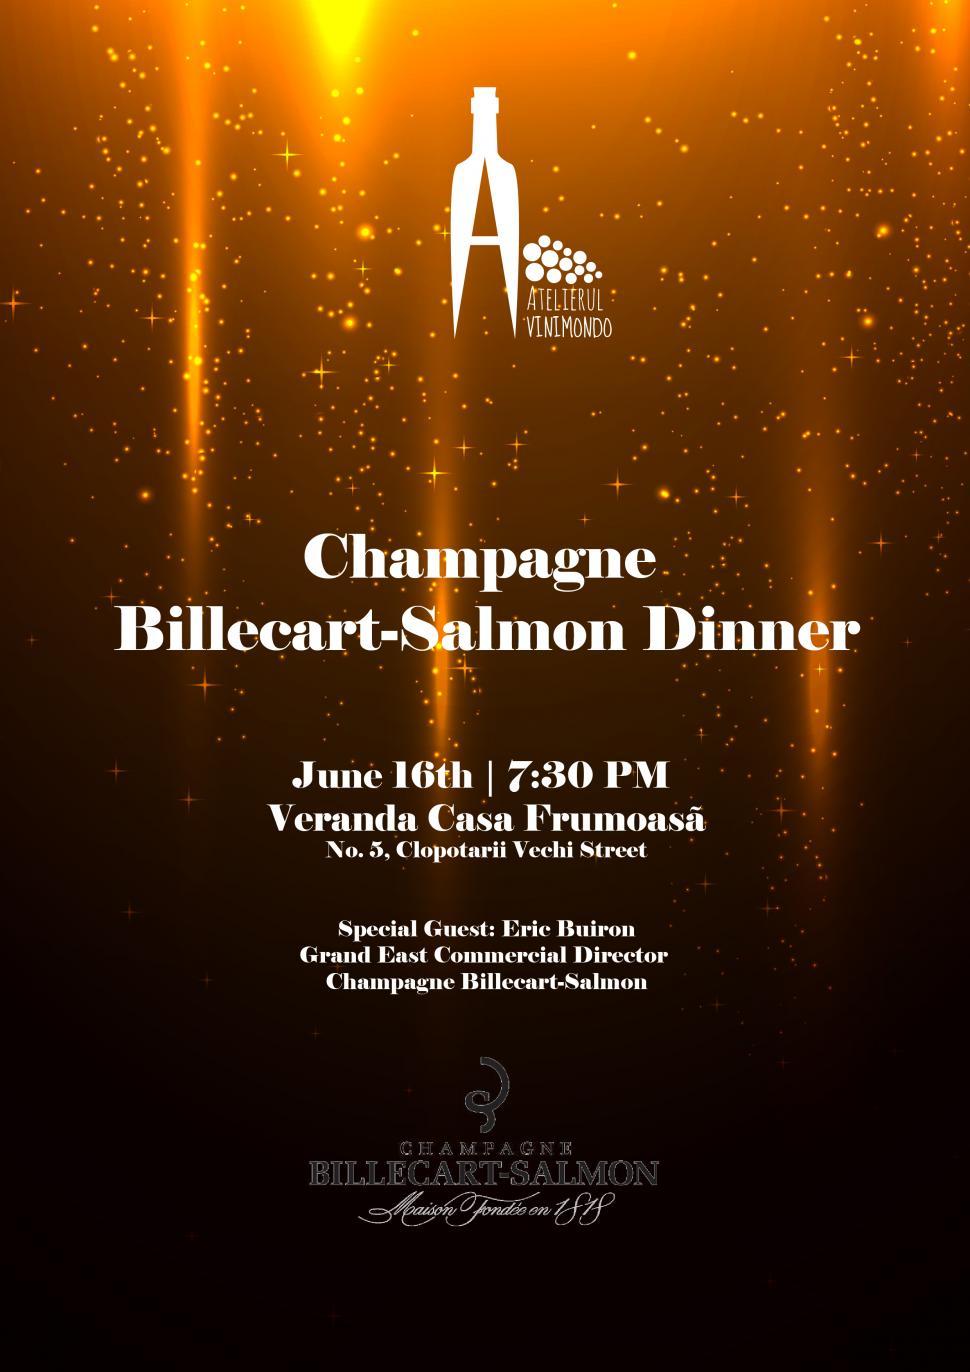 Champagne Billecart-Salmon Dinner